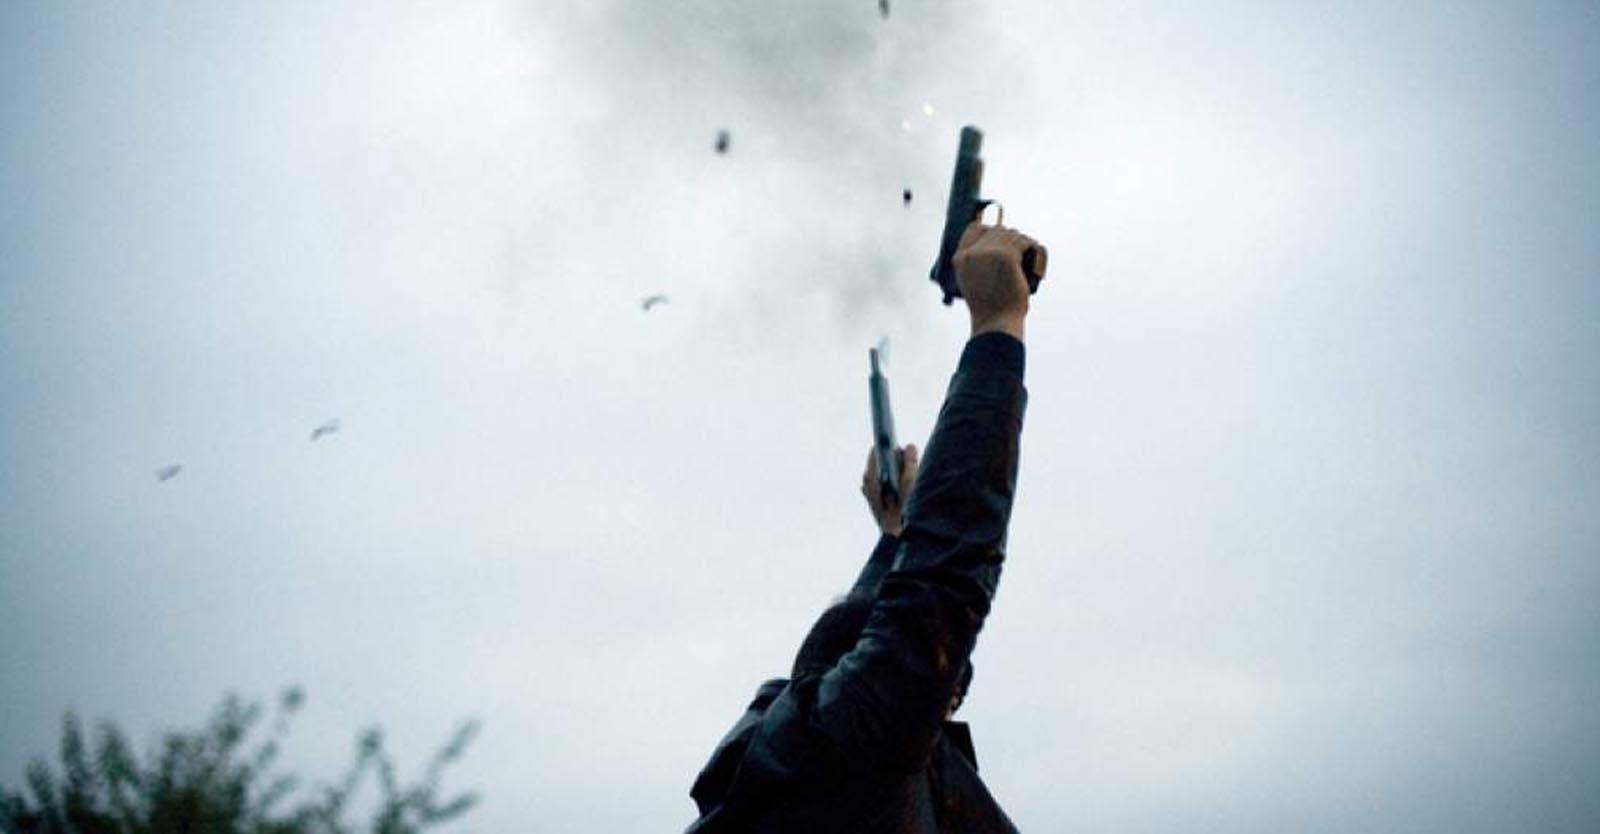 disparos-al-aire-heridos-en-sinaloa